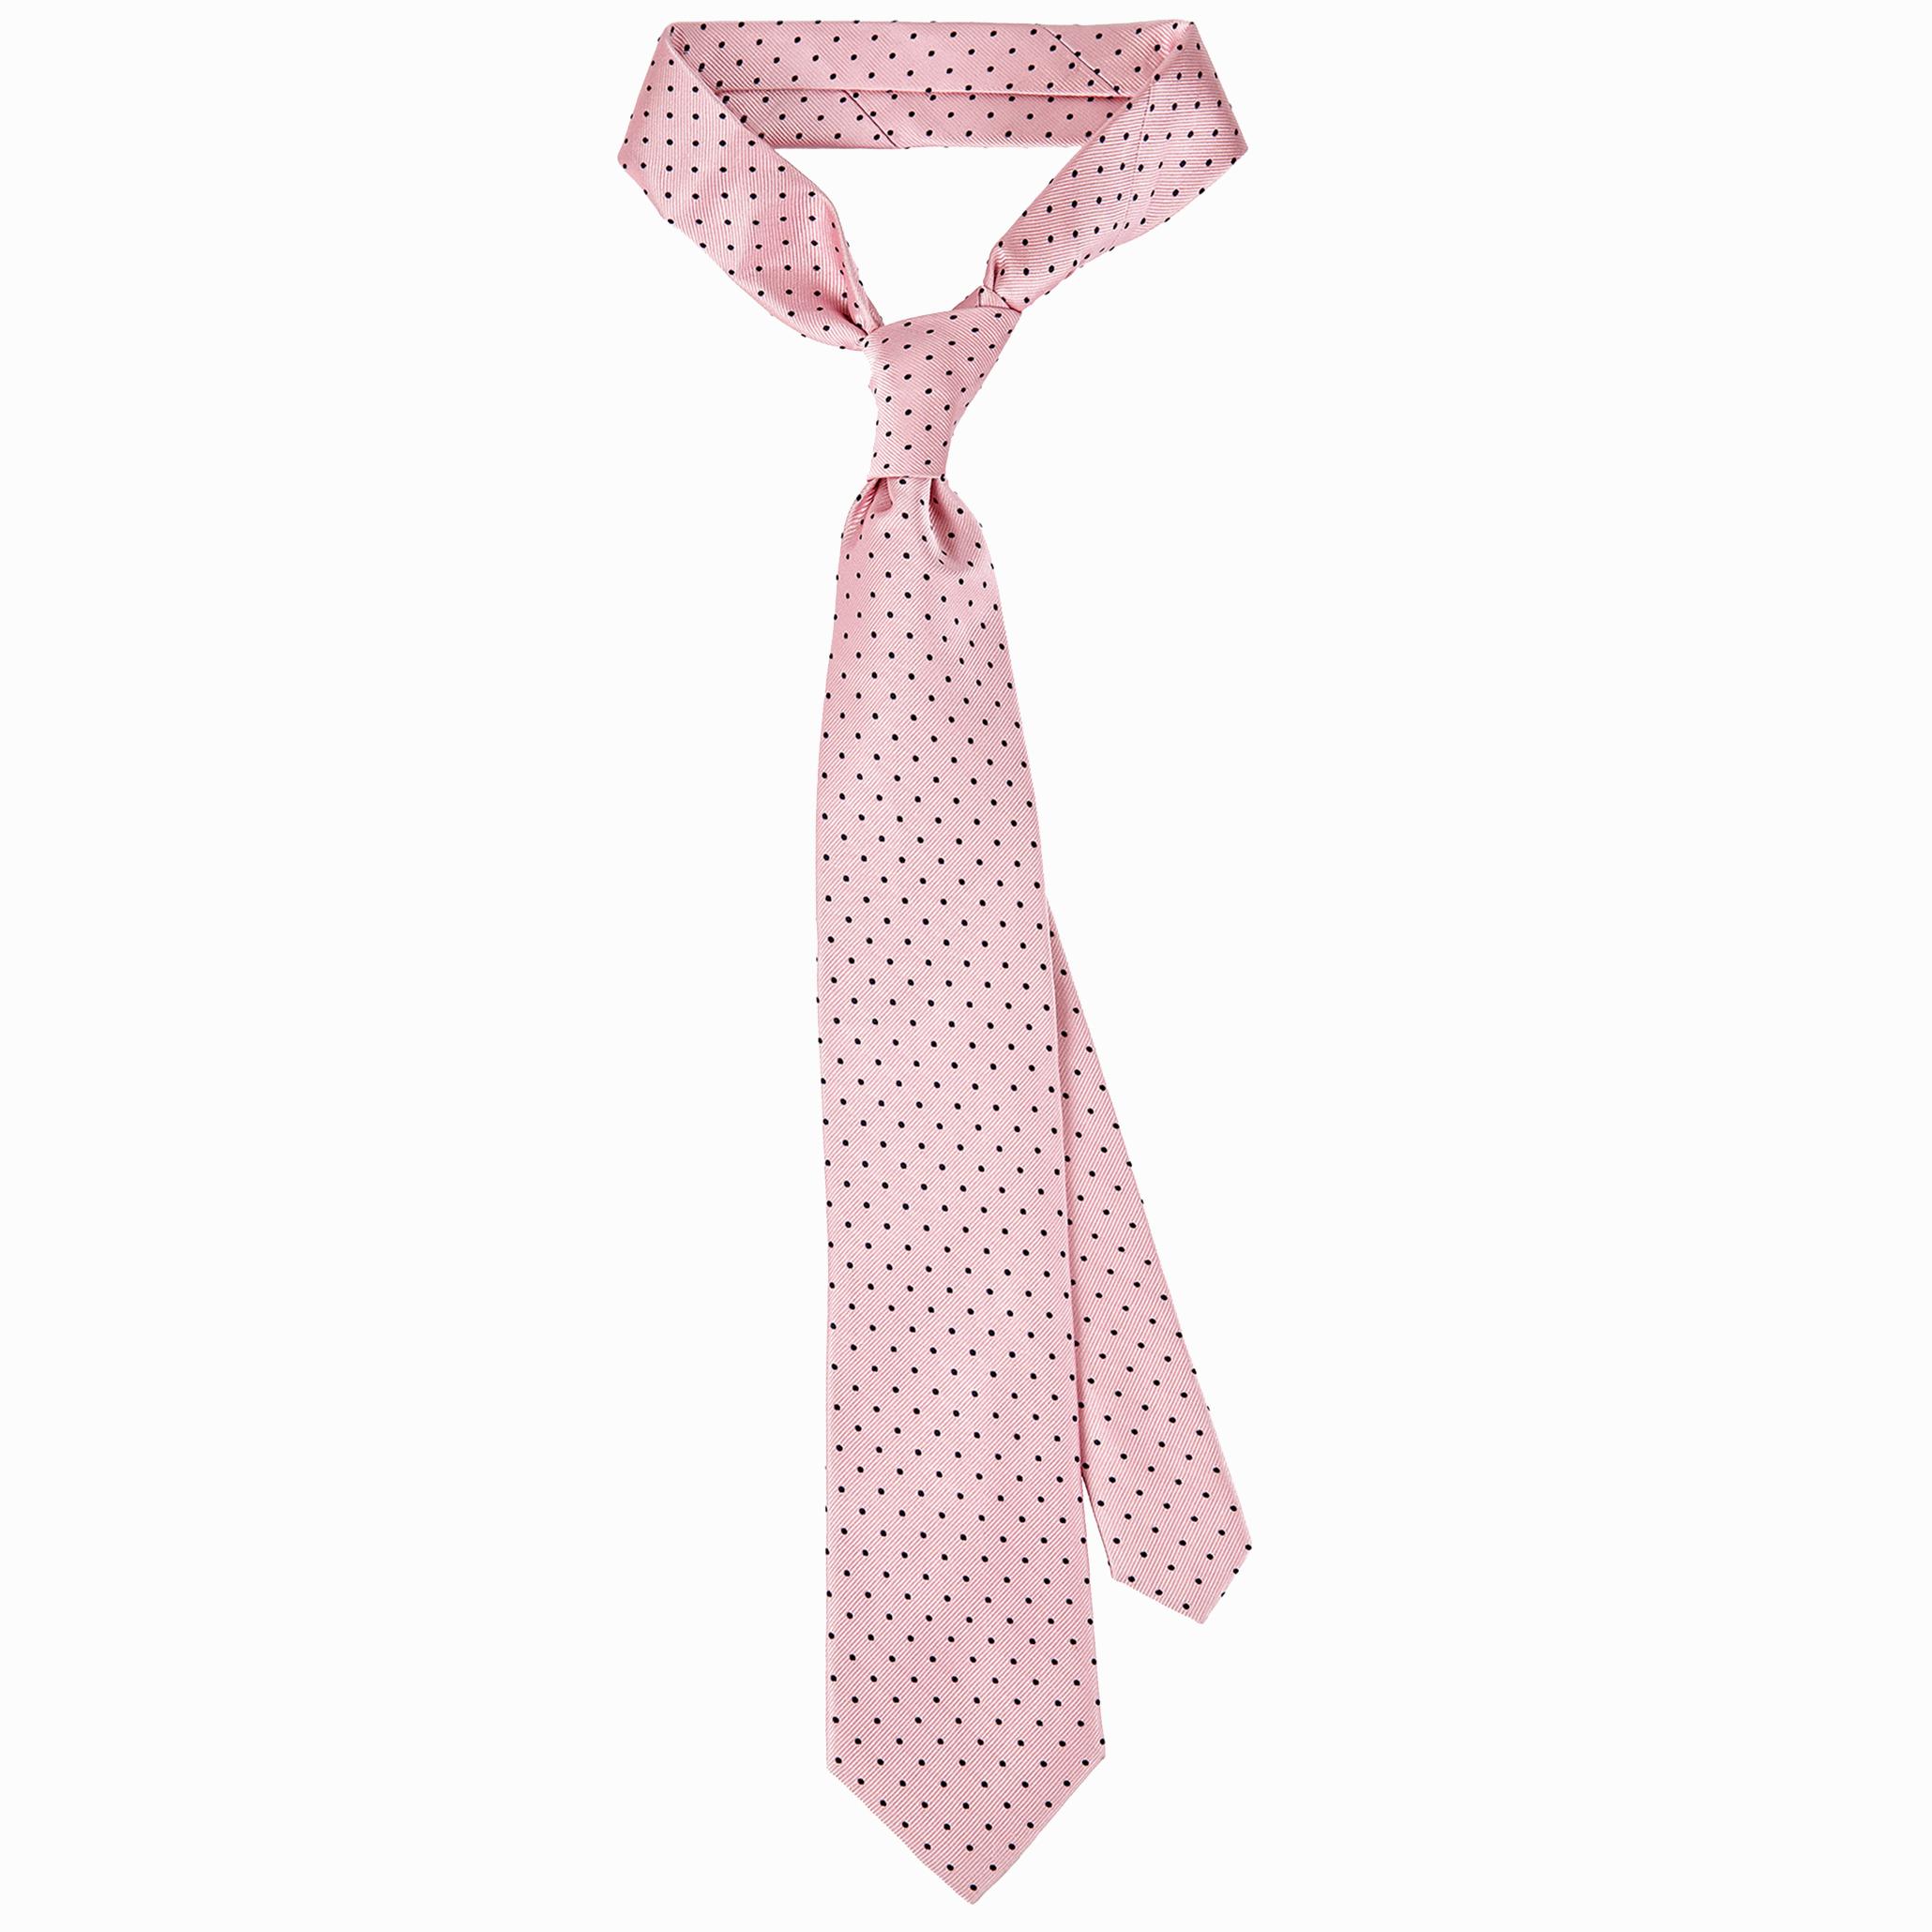 11_Tie_Dot_Pink Navy.jpg